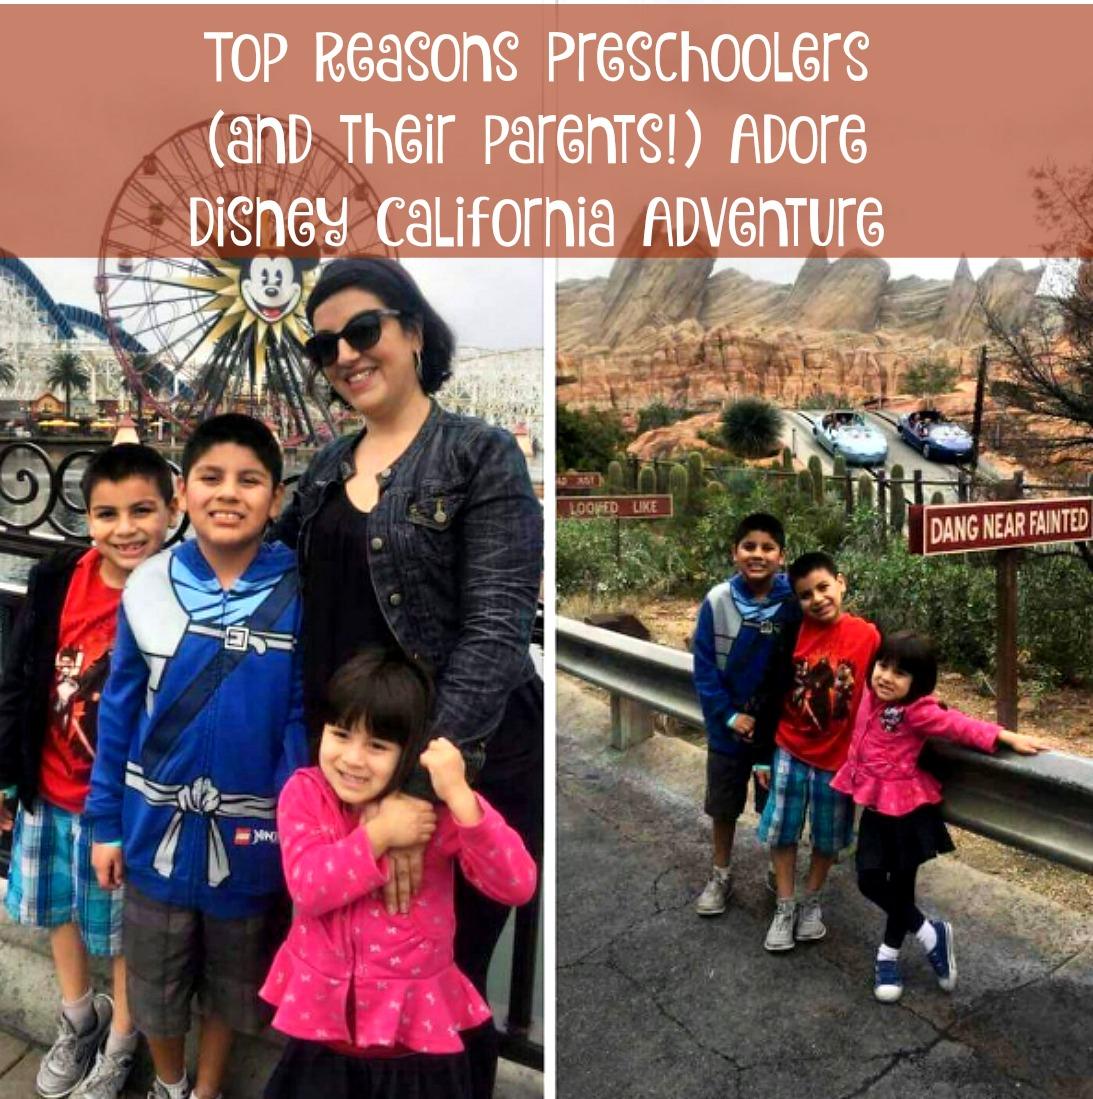 top-reasons-preschoolers-and-their-parents-adore-disneys-california-adventure